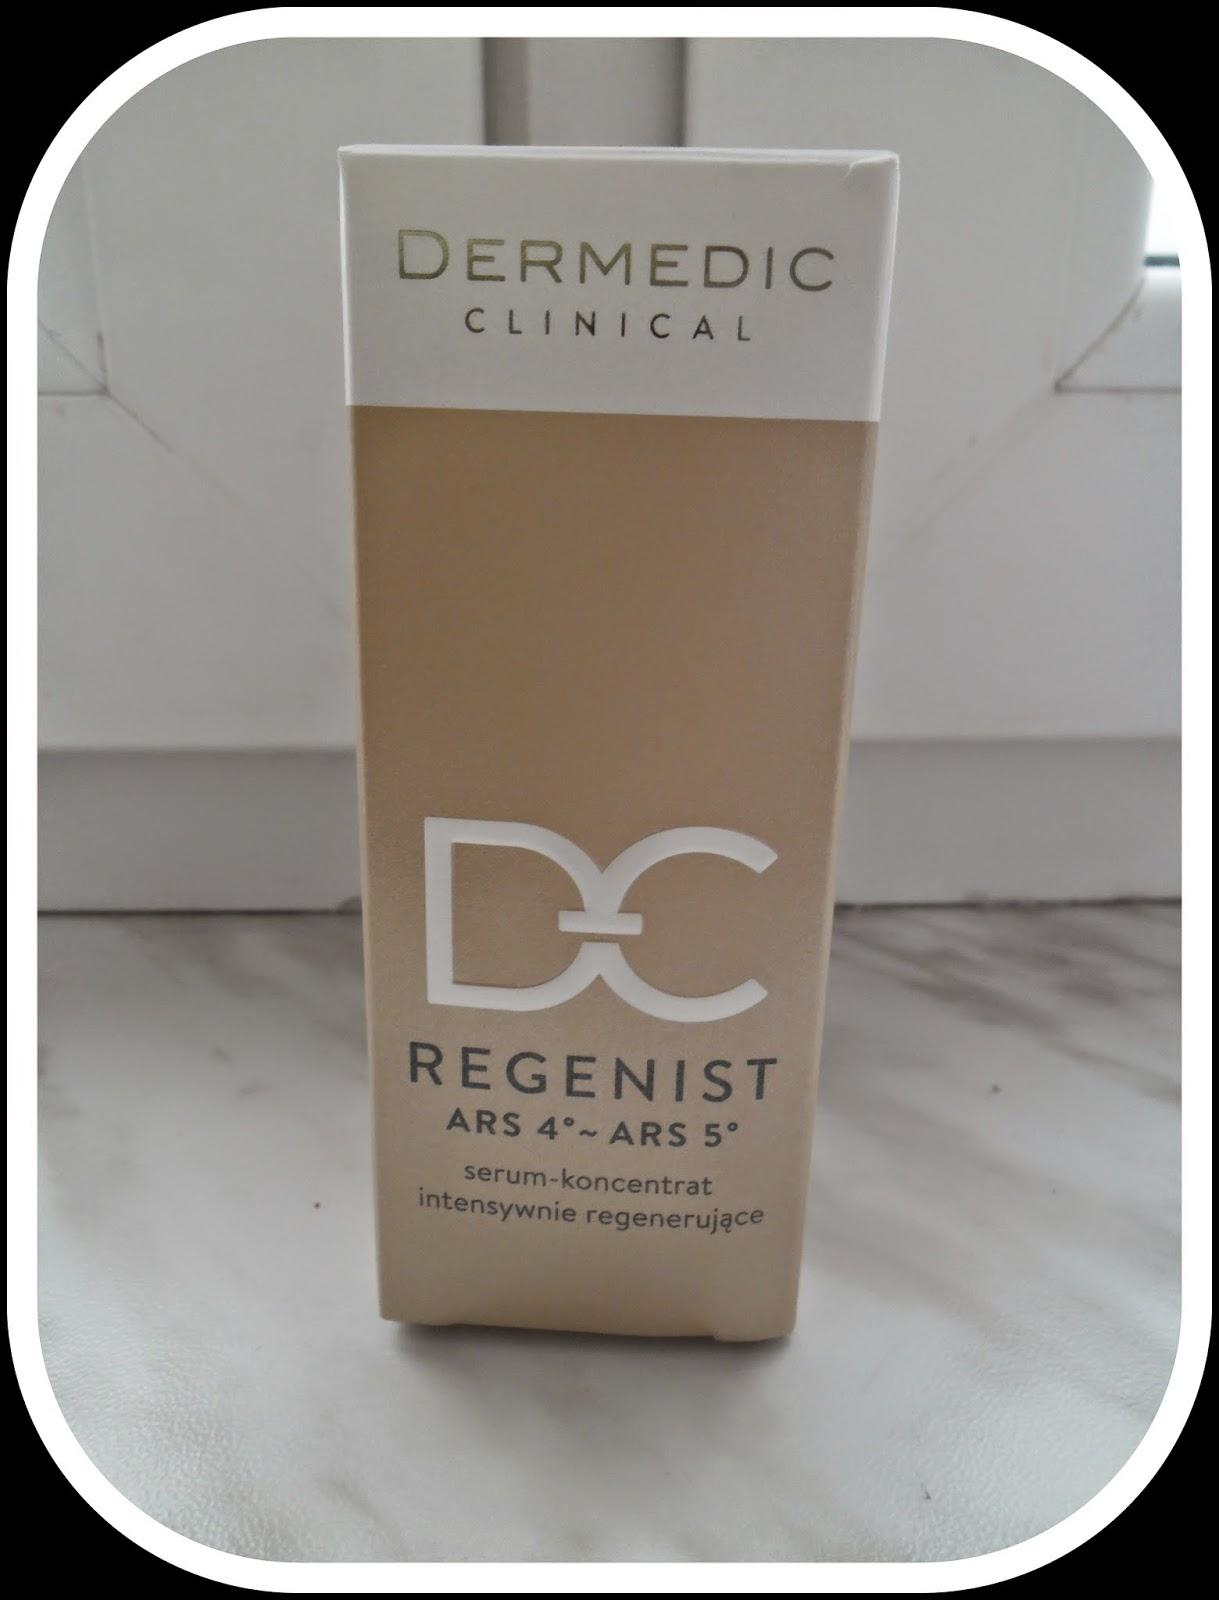 Serum-koncentrat intenywnie regenerujące ARS 4°~ARS 5° Dermedic- recenzja